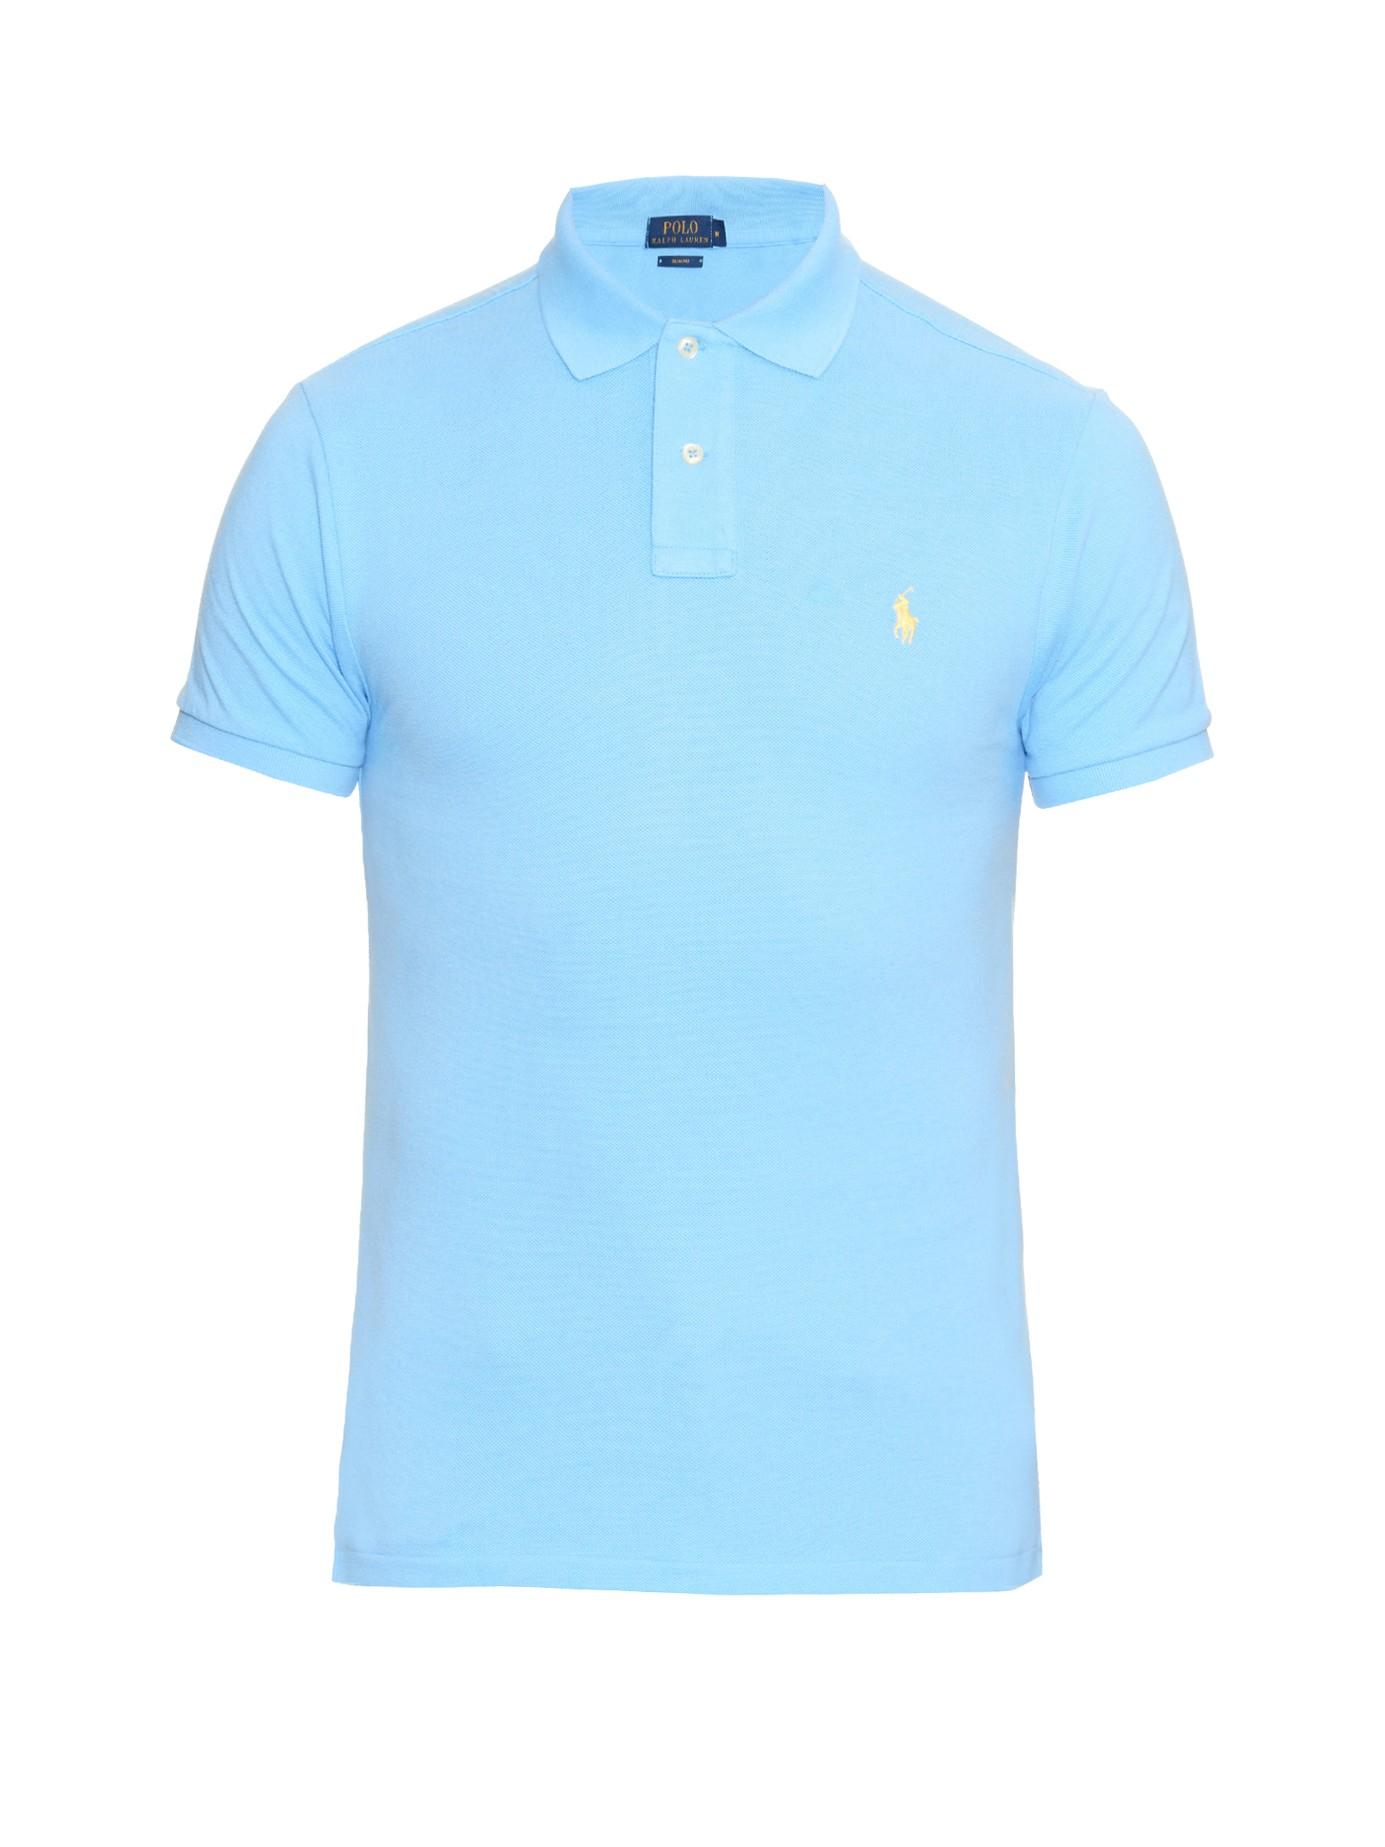 93cd32bb410 switzerland lyst polo ralph lauren slim fit cotton piqué polo shirt in blue  99496 28b9f